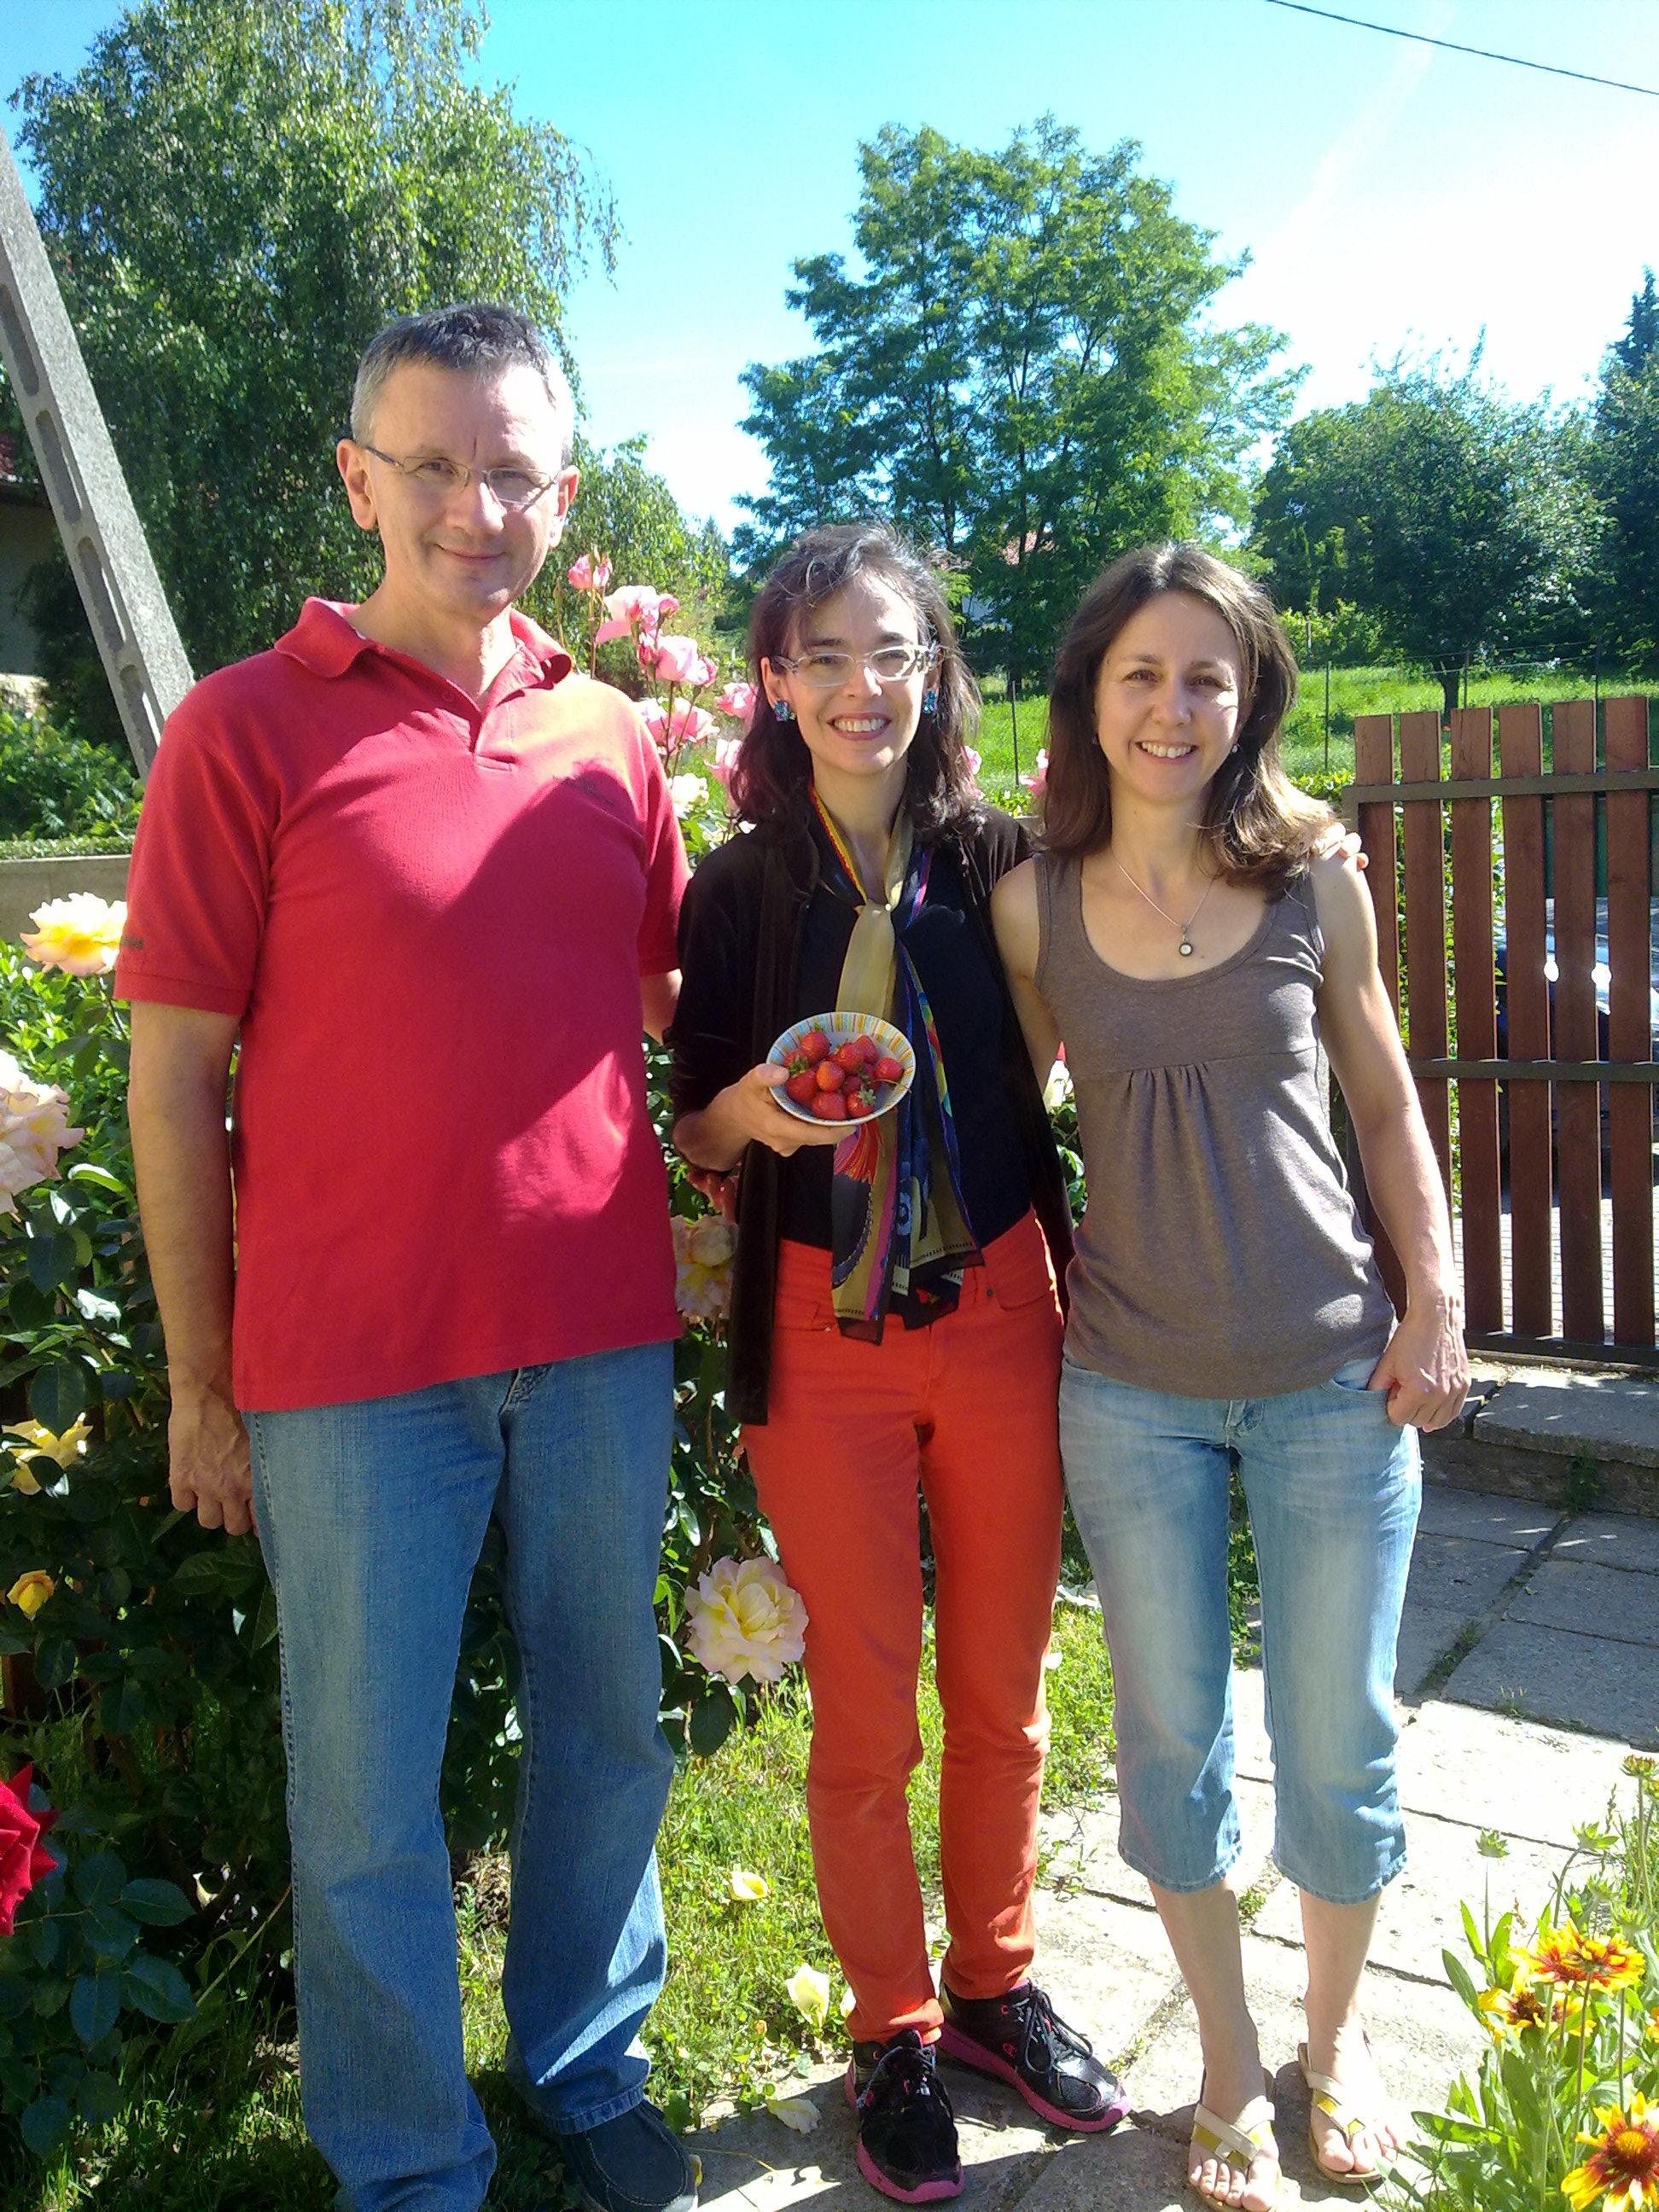 Erno, Lenore, Erika at the Gyori home in Csobanka!